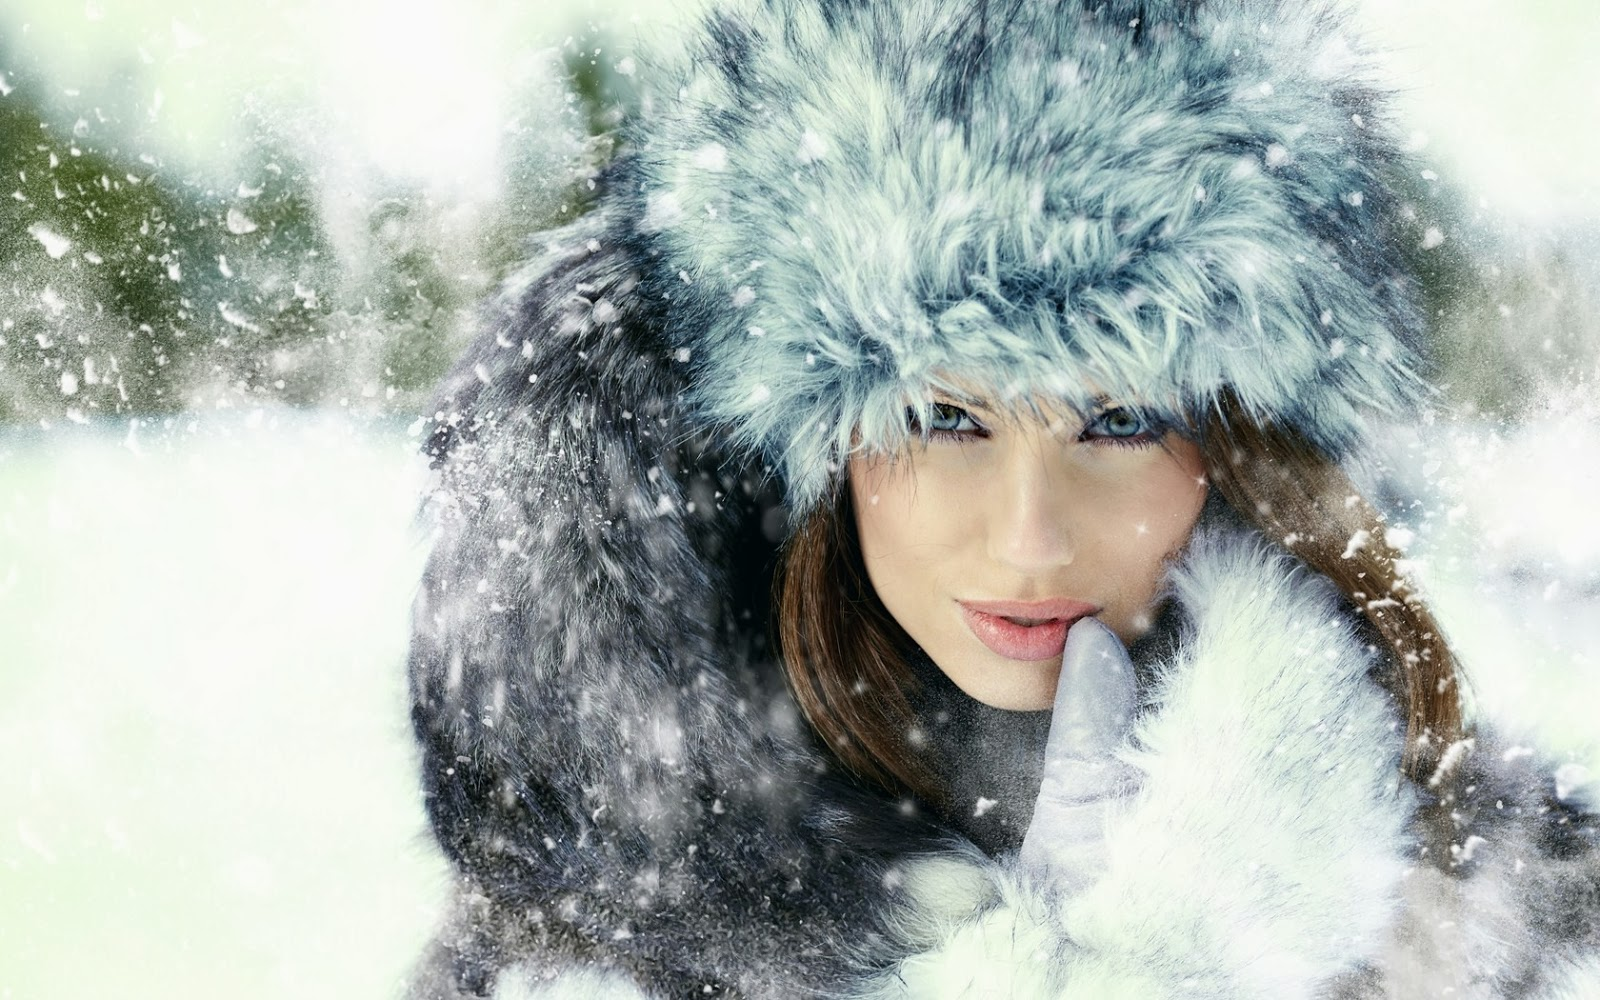 gadis-fashion-foto-musim dingin-salju-kepingan salju-wallpaper-1680x1050